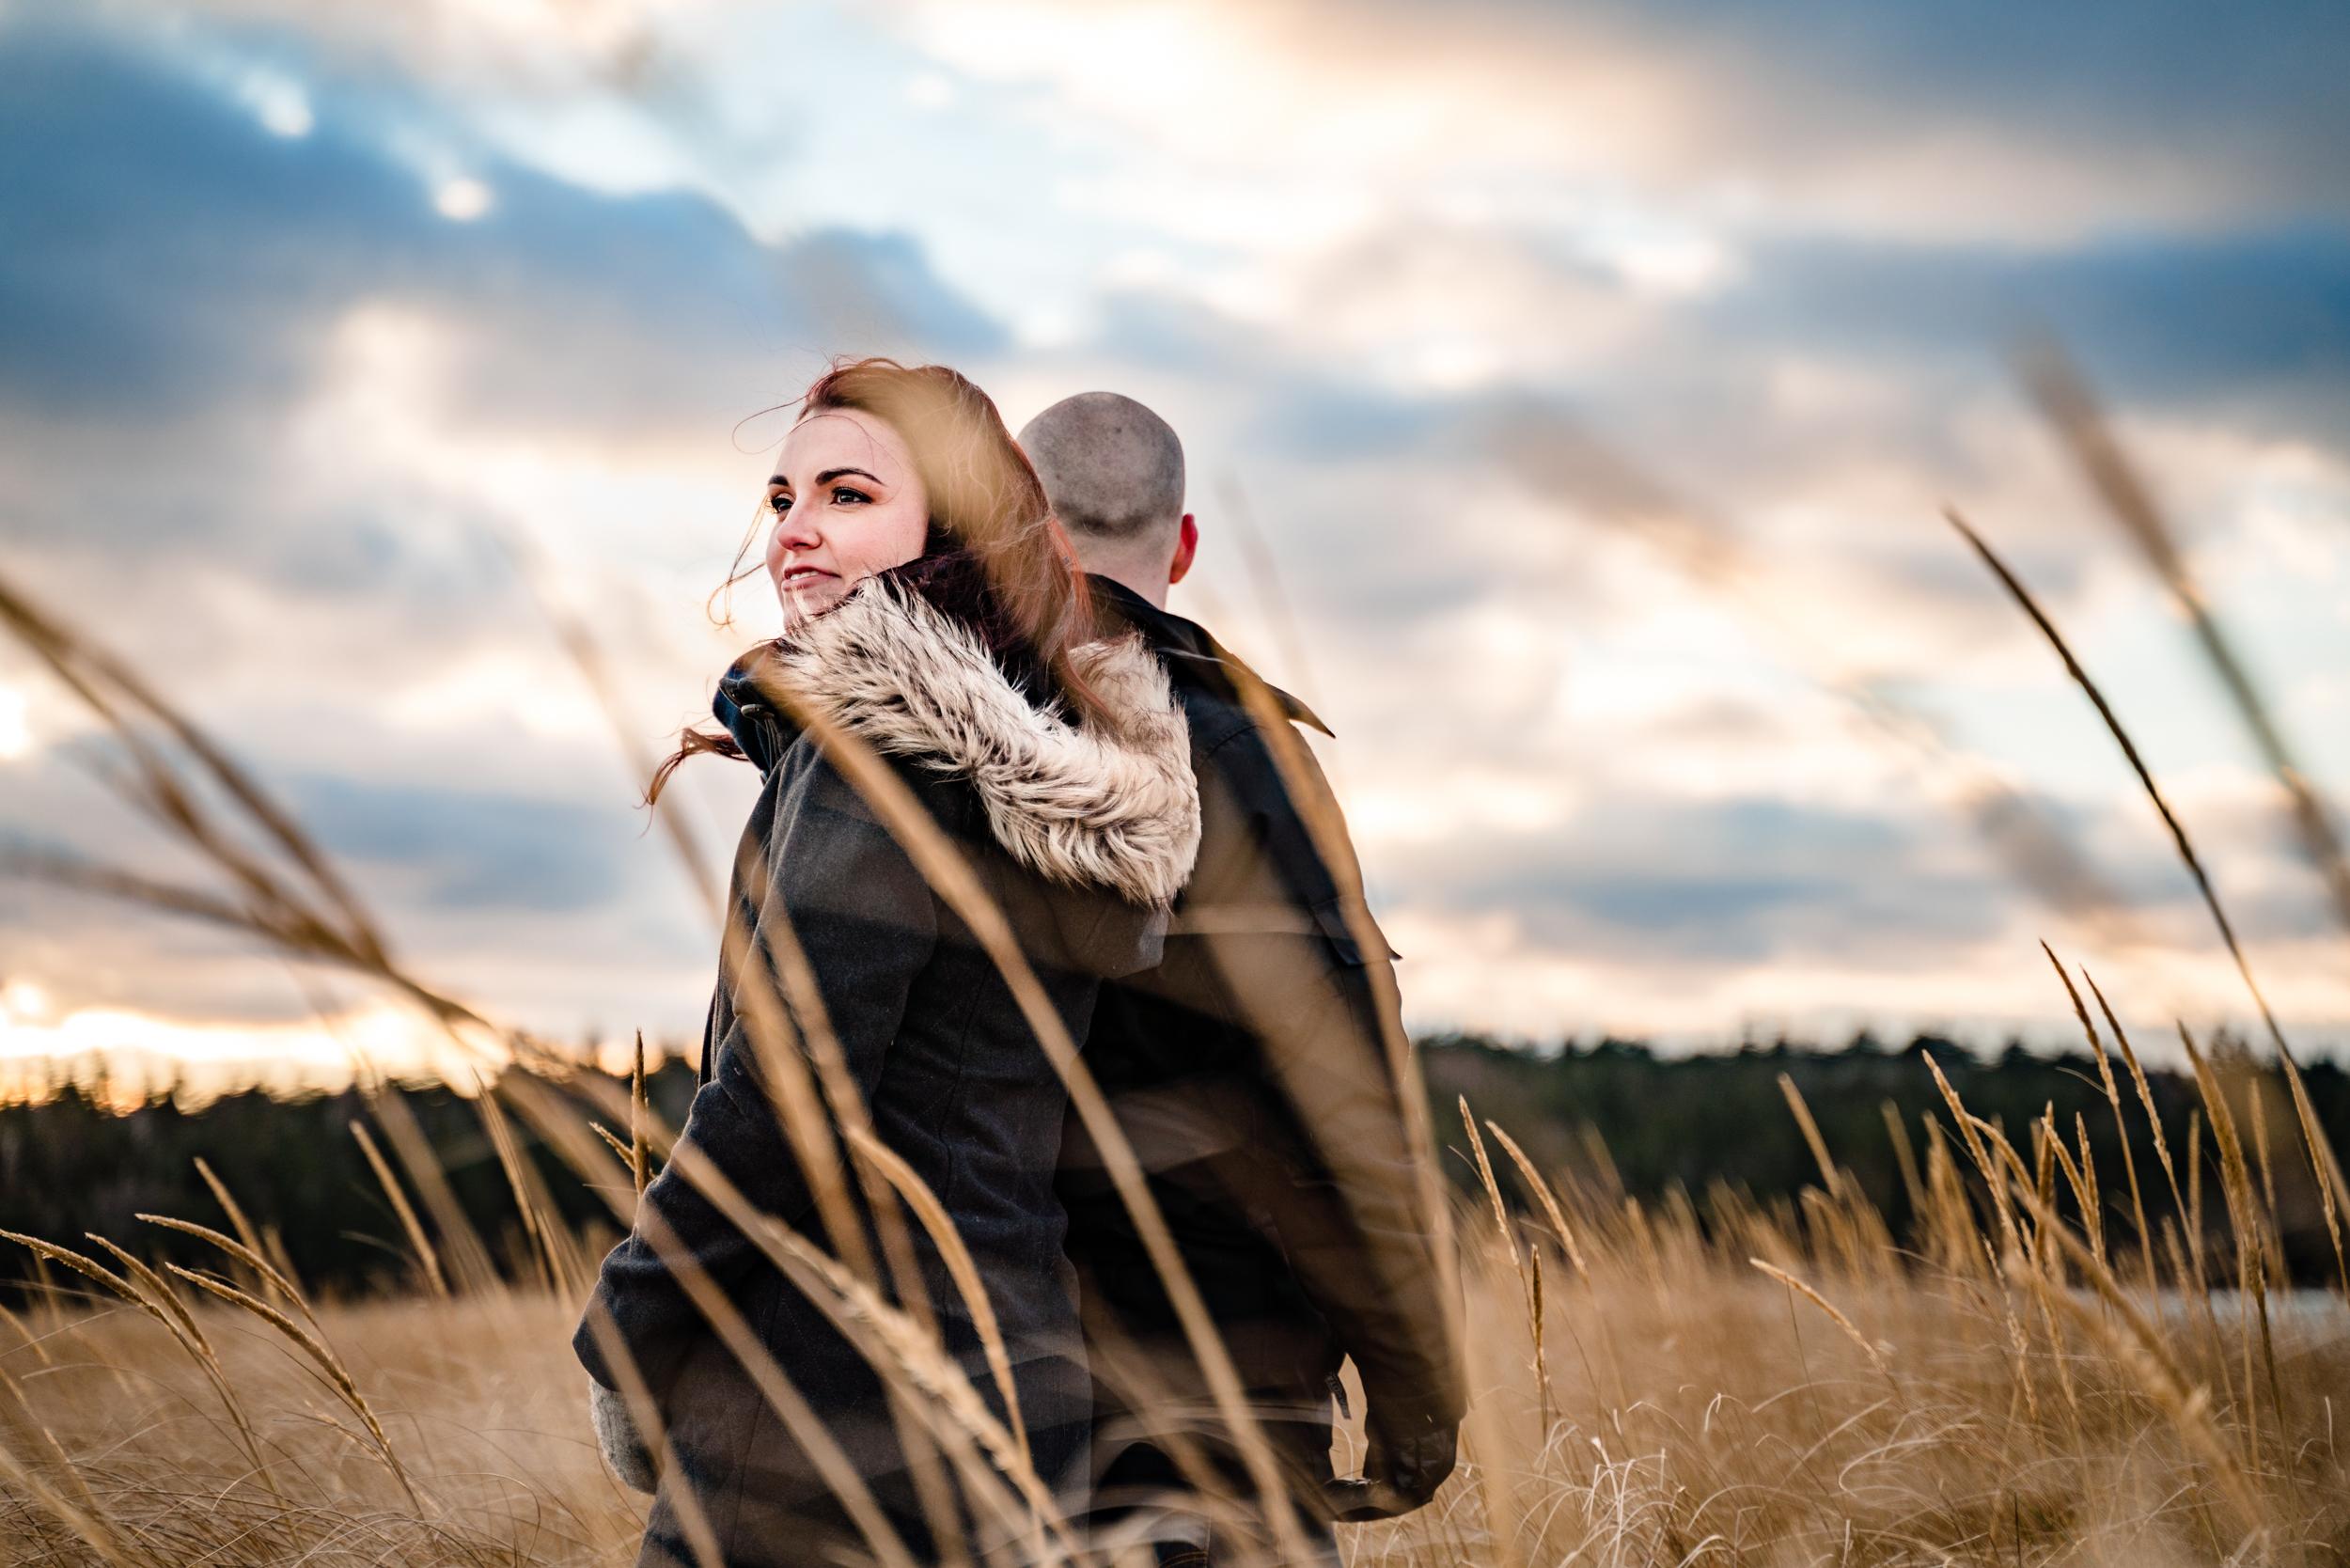 Sarah&Shayne-Halifax-engagement-weddingphotography-weddingphotographers-novascotia (24 of 41).jpg